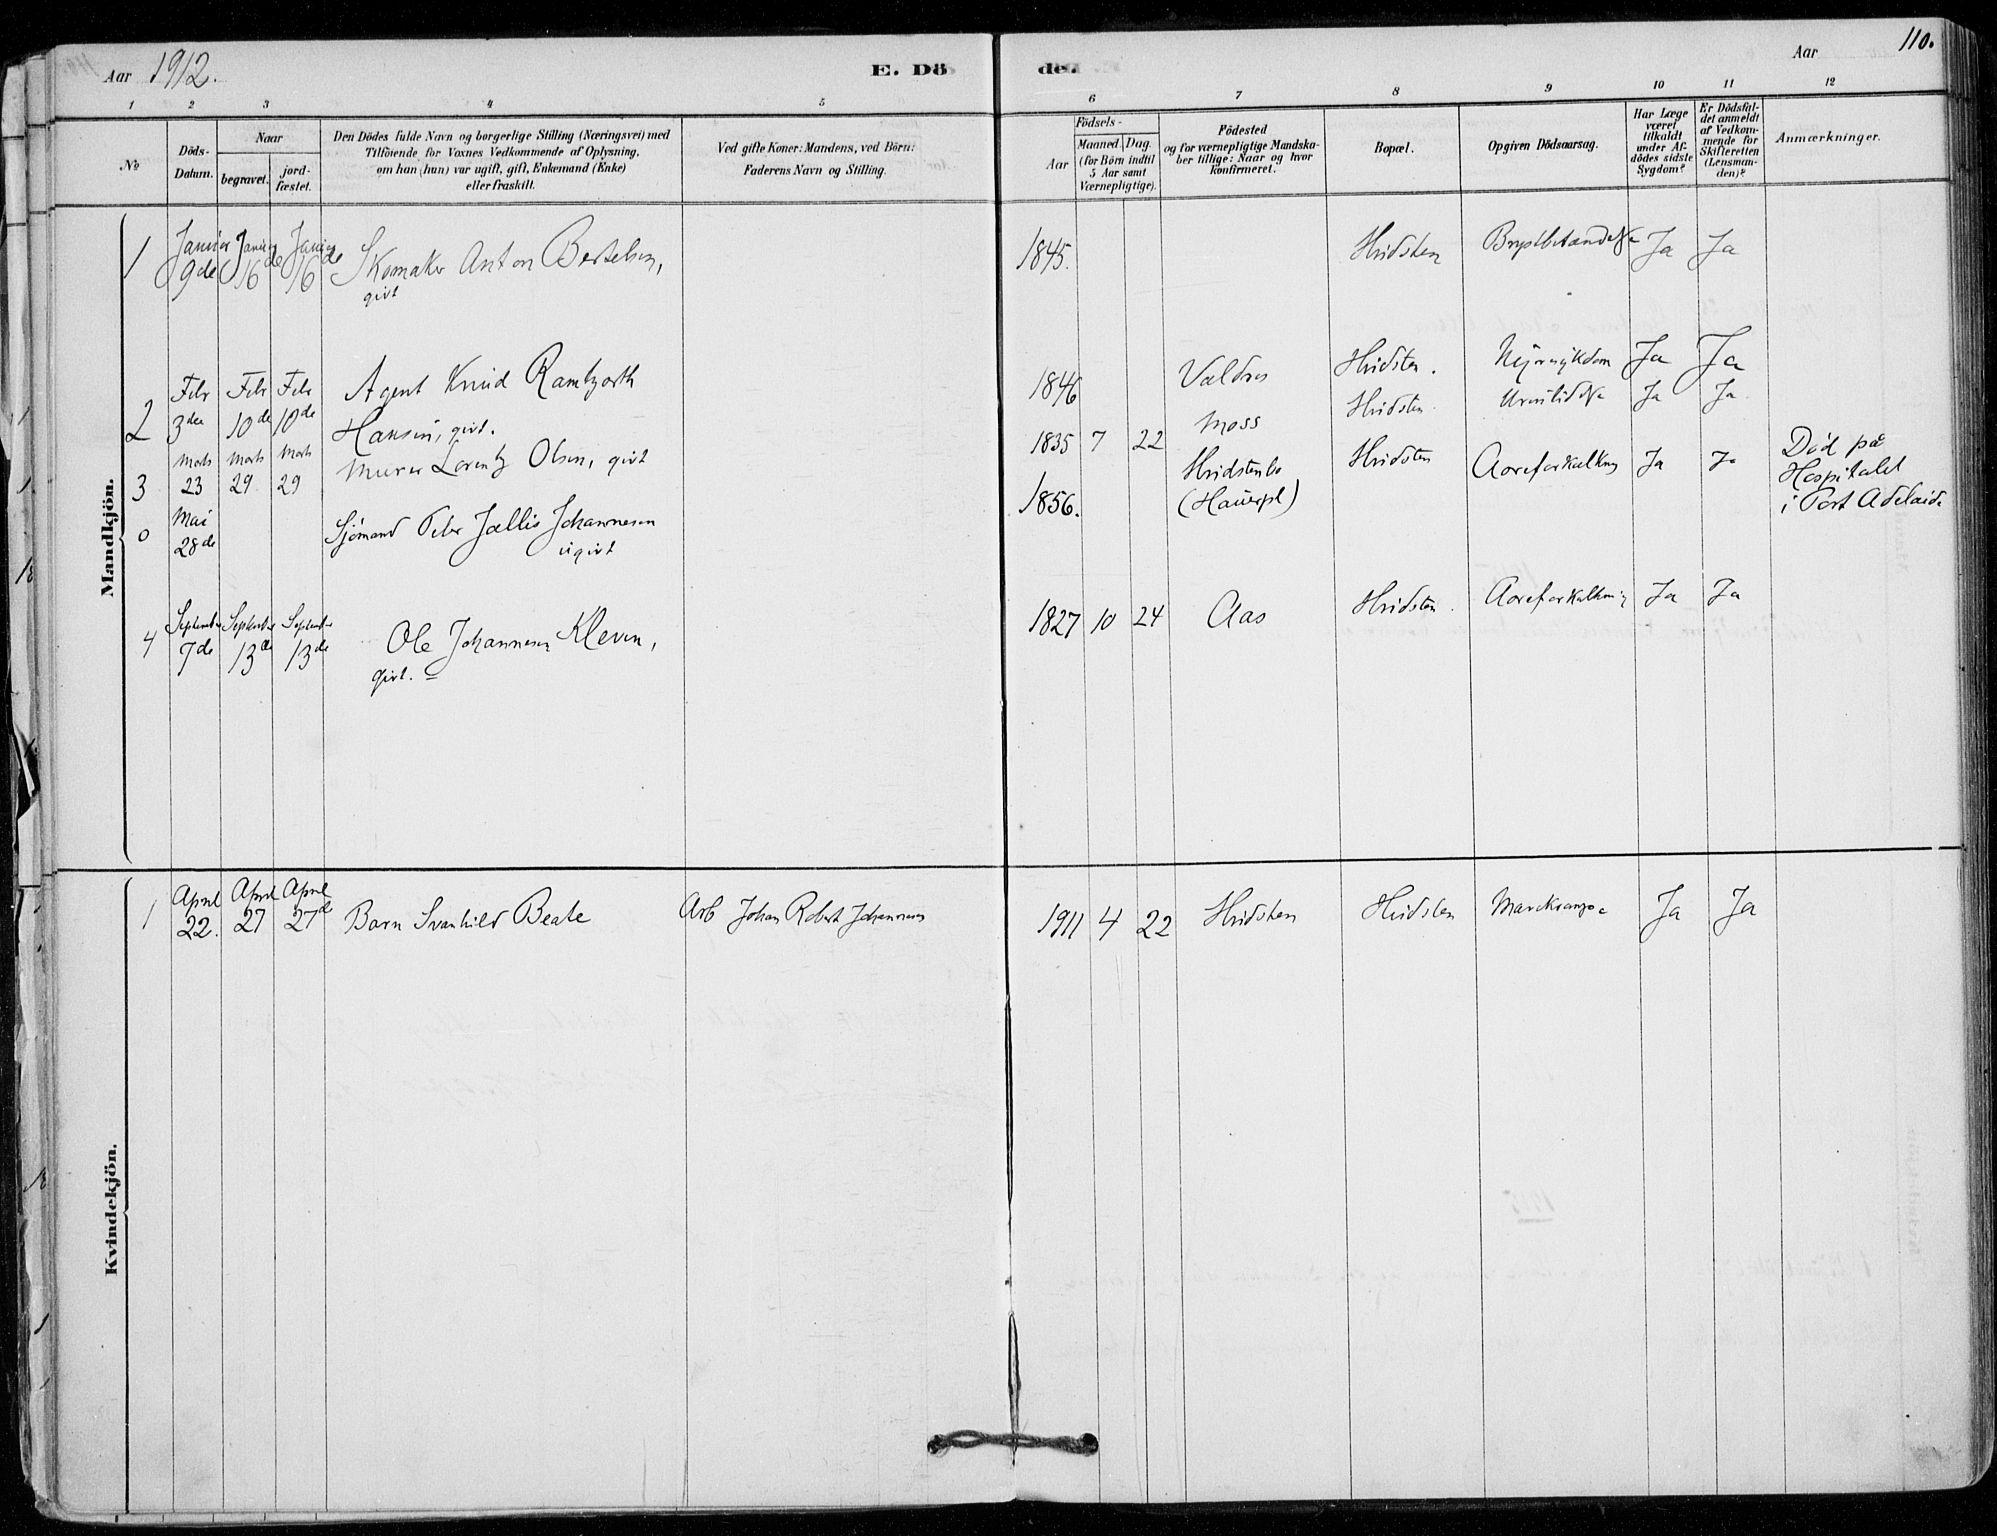 SAO, Vestby prestekontor Kirkebøker, F/Fd/L0001: Ministerialbok nr. IV 1, 1878-1945, s. 110